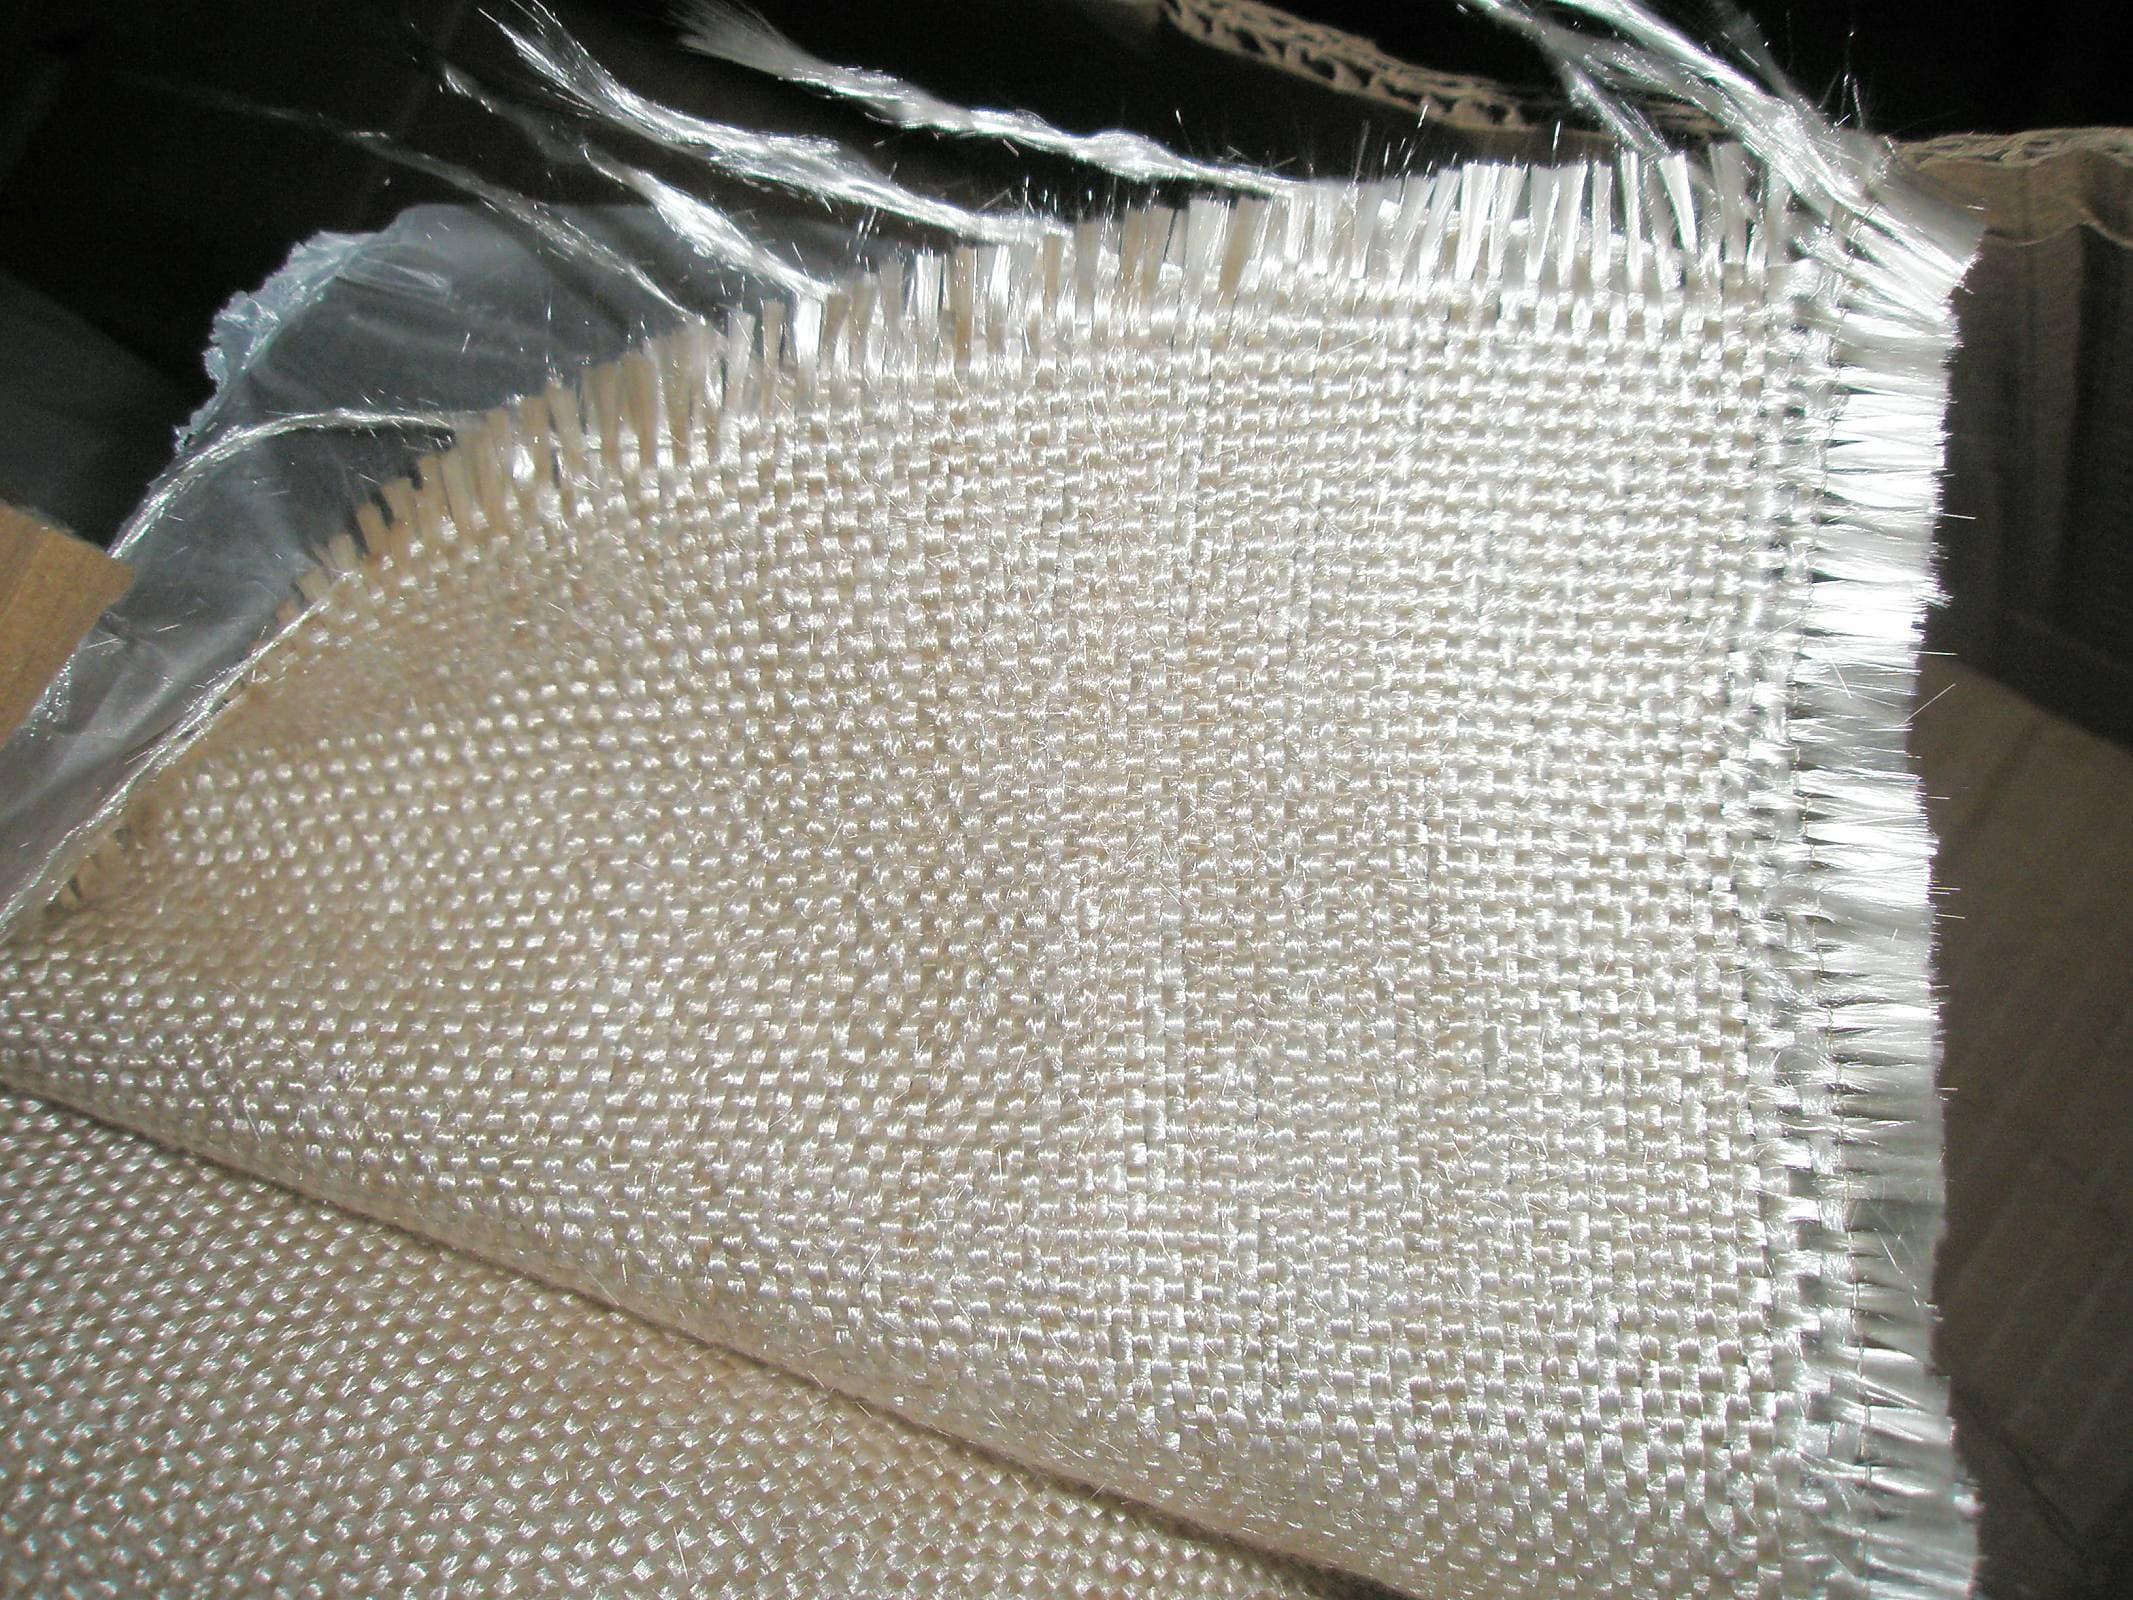 Fiberglass Insulation Cloth From Eas Fiberglass Co Ltd